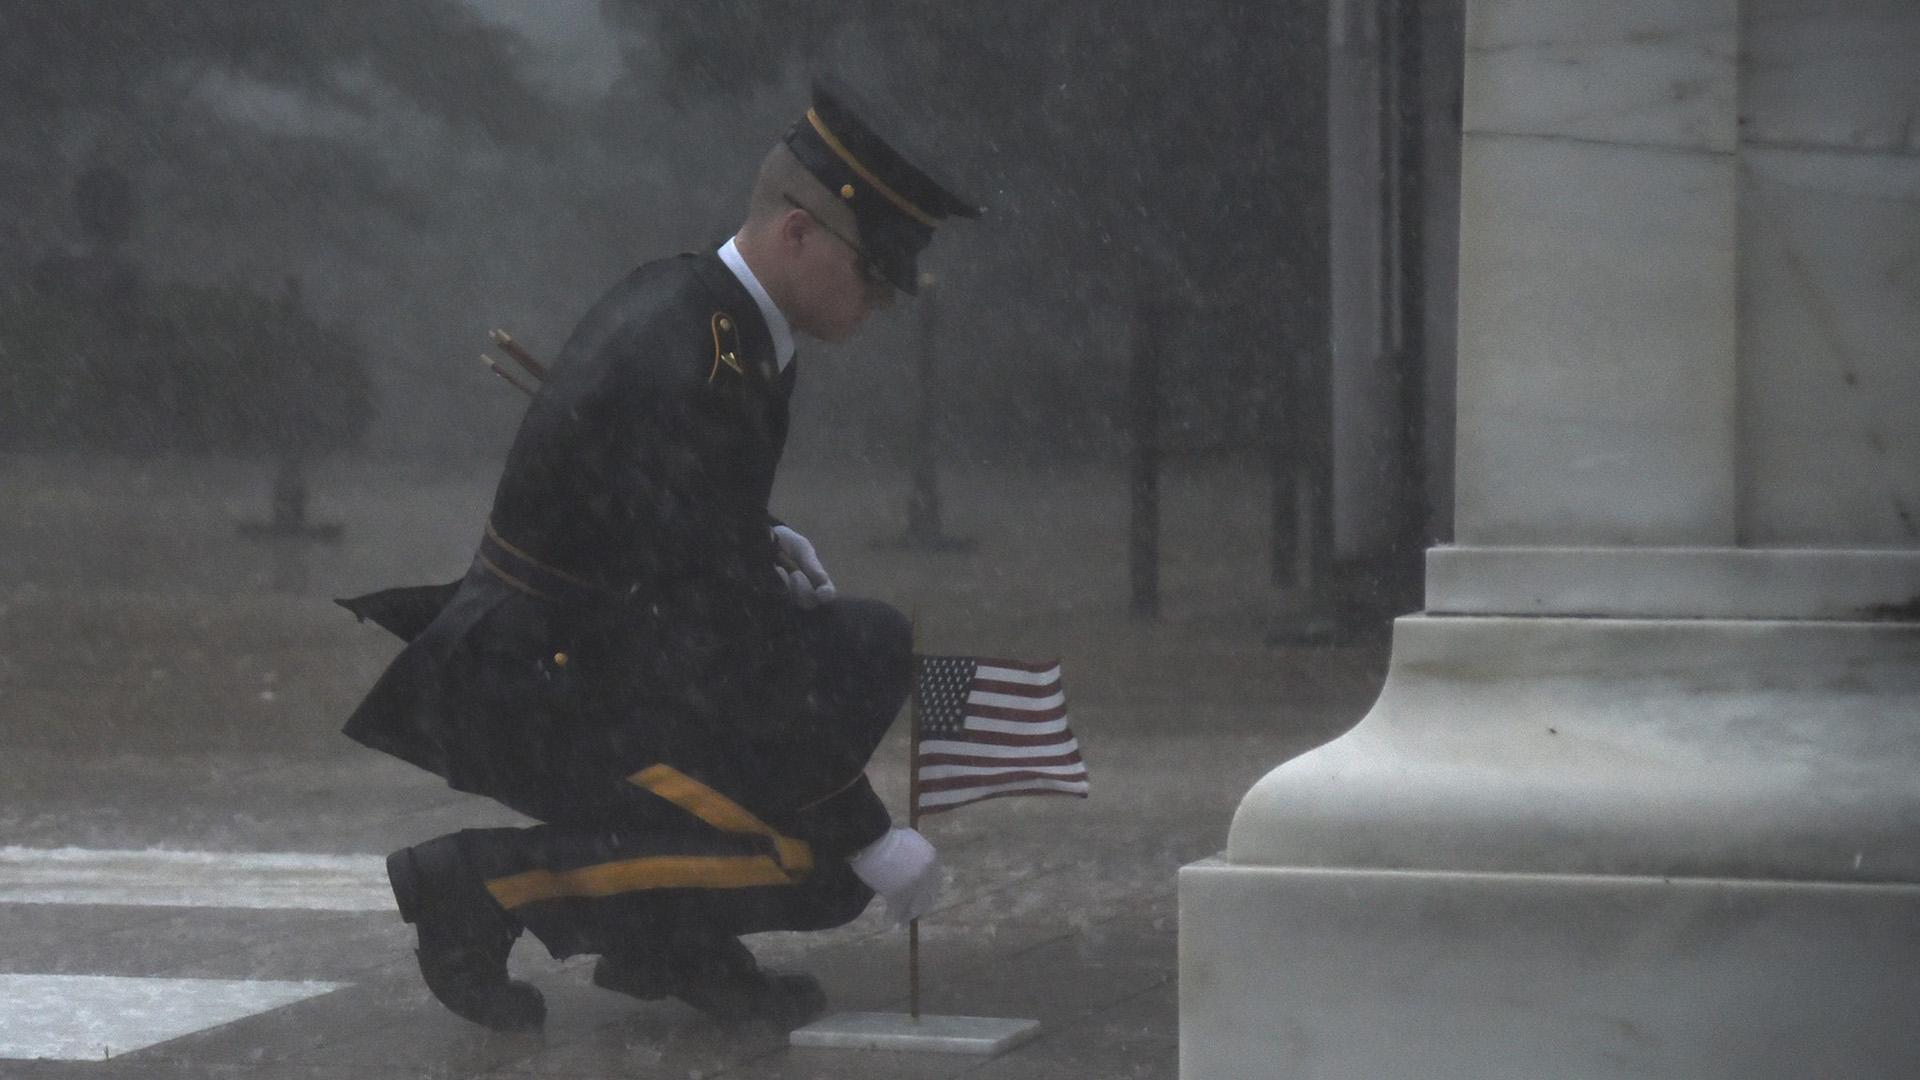 Soldier braves severe weather to honor fallen_1558867299452.jpg-846652698.jpg